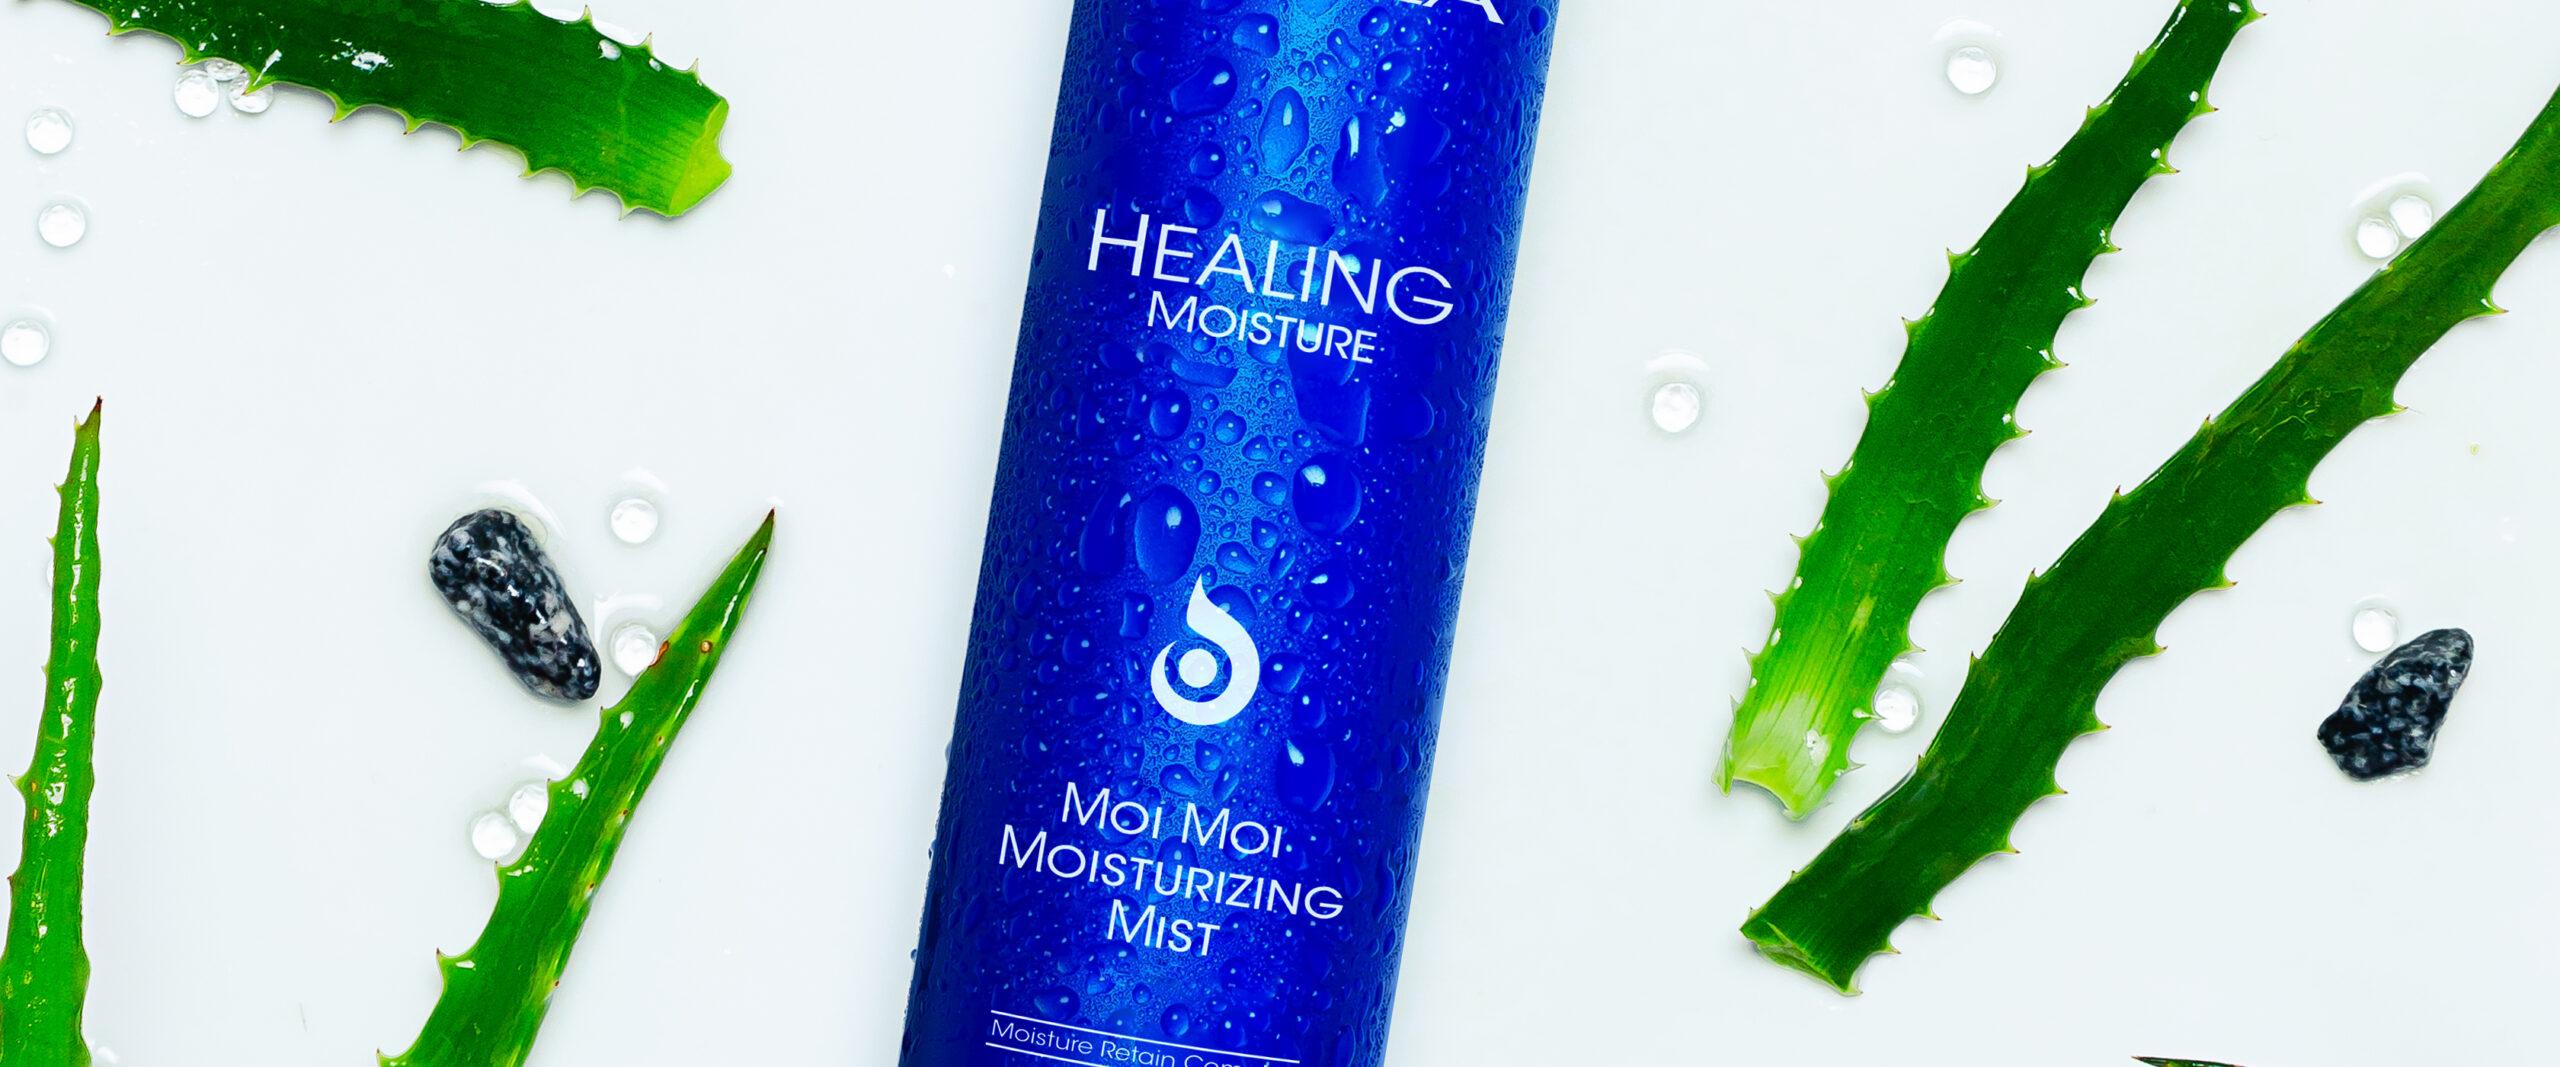 HealingMoisture